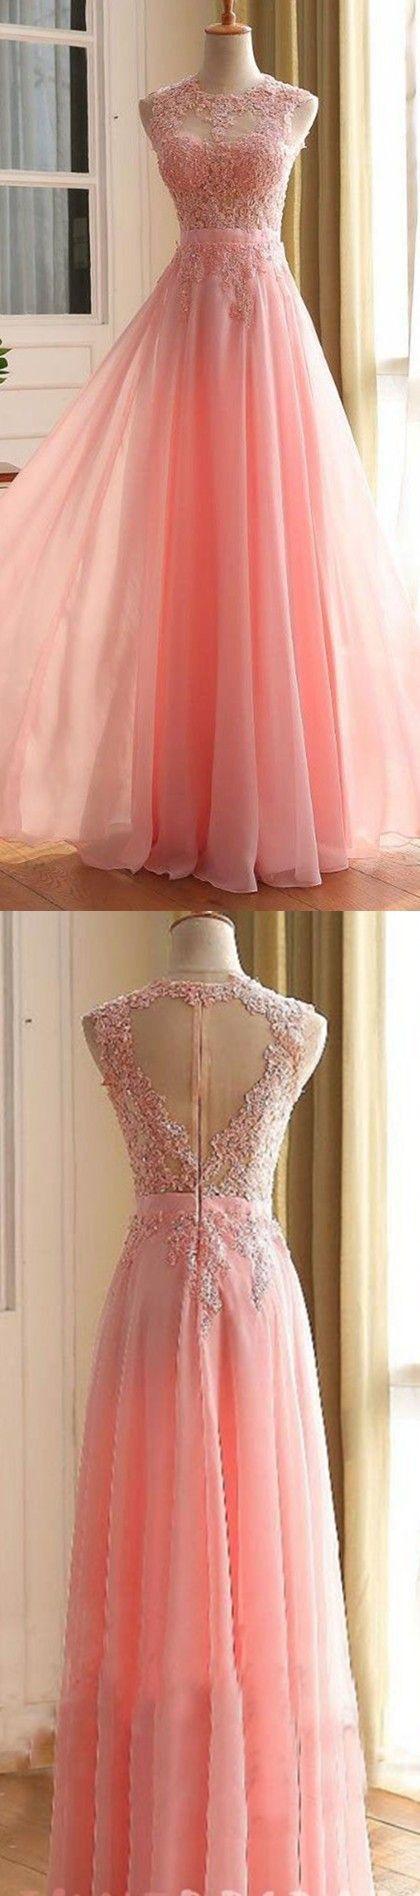 Charming Long Prom Dress, Appliques Pink Prom Dress,Elegant Prom ...